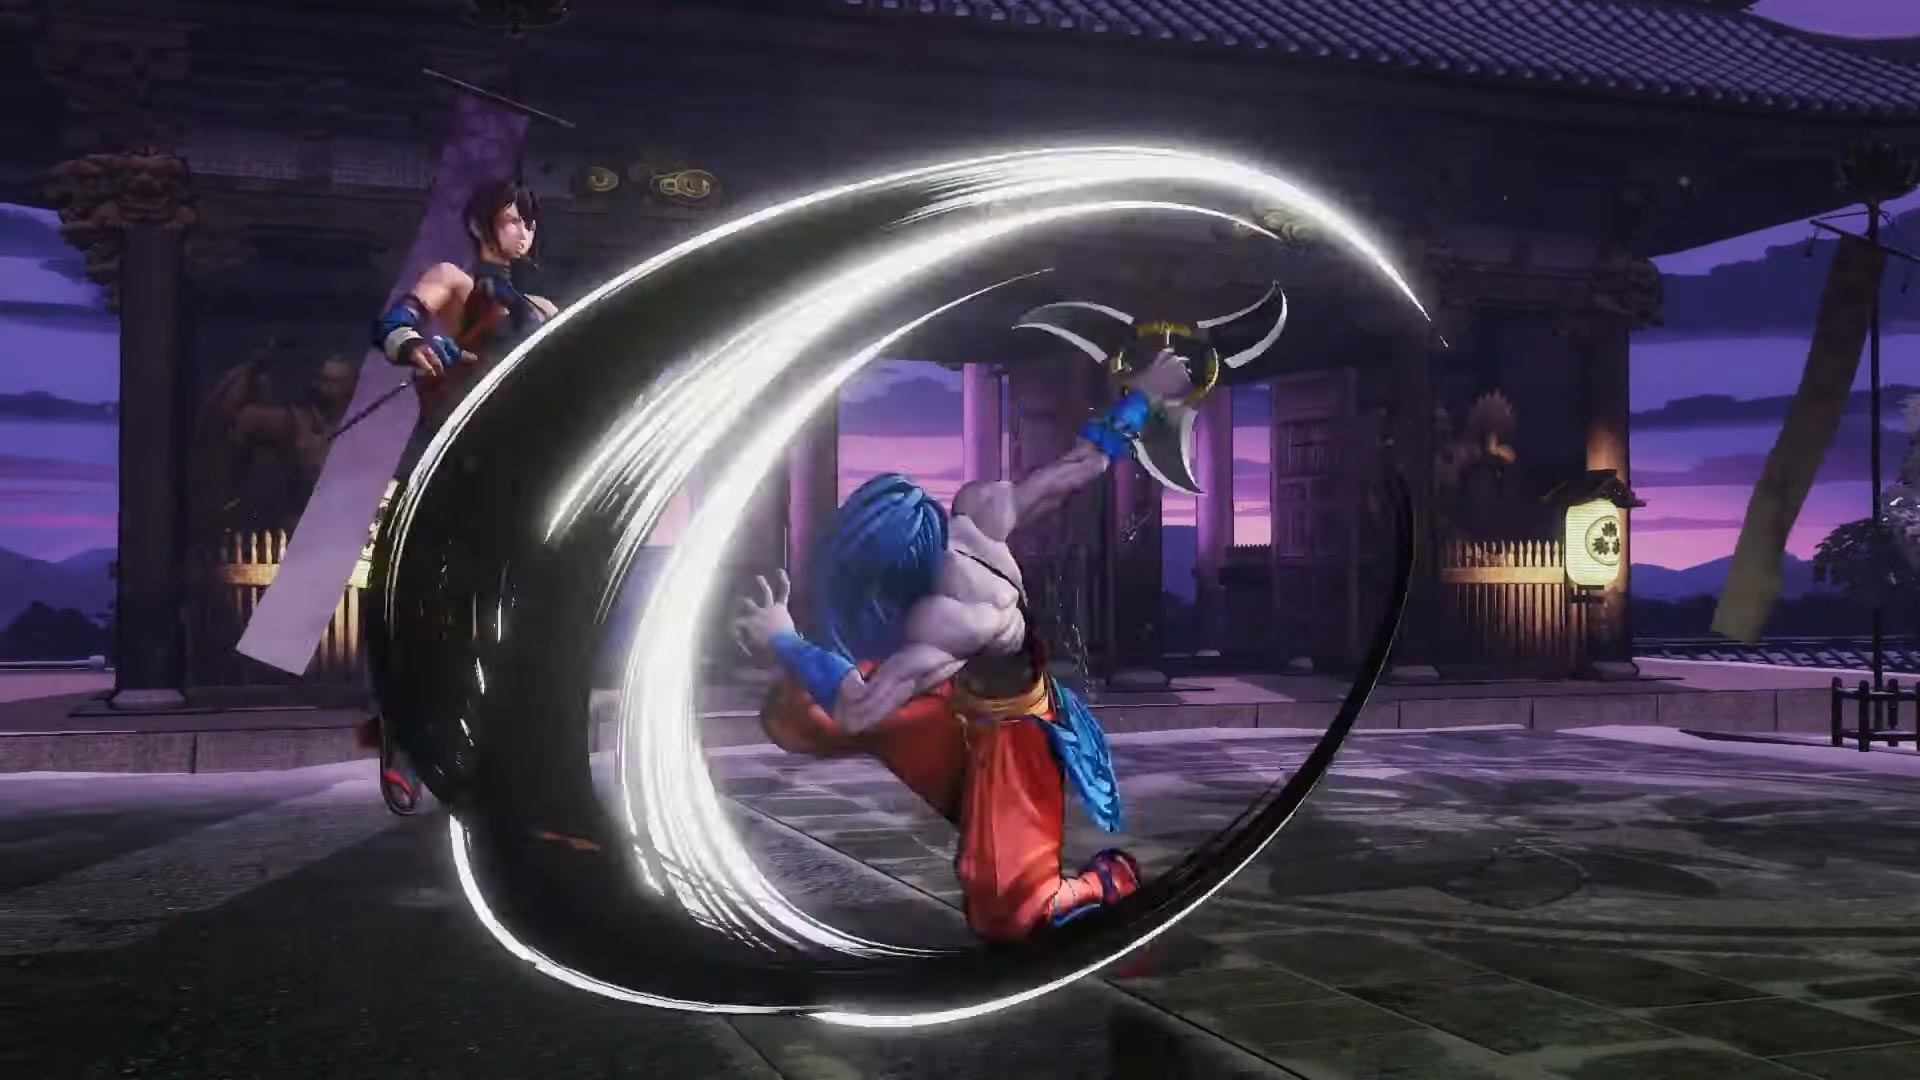 Samurai Shodown Basara Trailer Screenshots 5 out of 9 image gallery